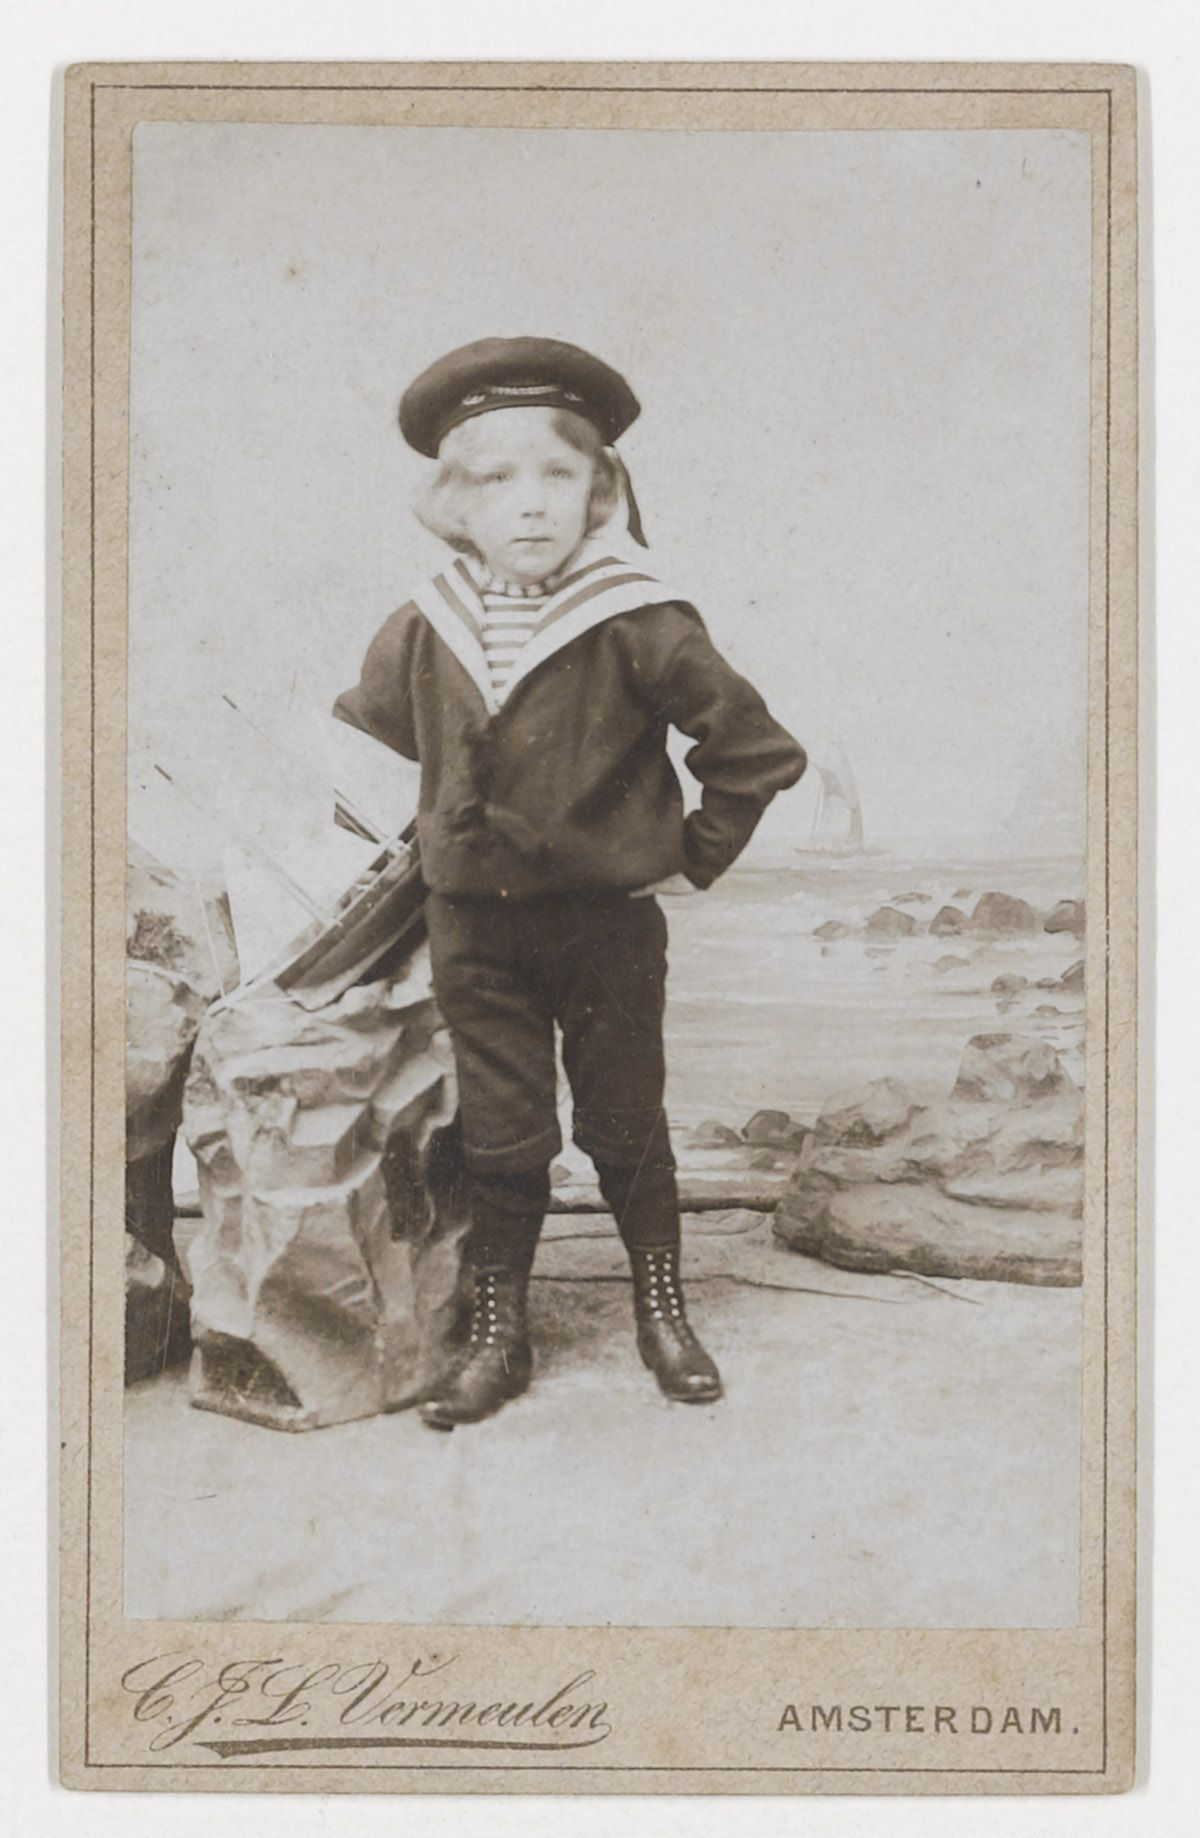 Vincent Willem van Gogh is sailor suit, ca. 1896. Photo studio Vermeulen Amsterdam Vincent Willem was the Son of Theo van Gogh.